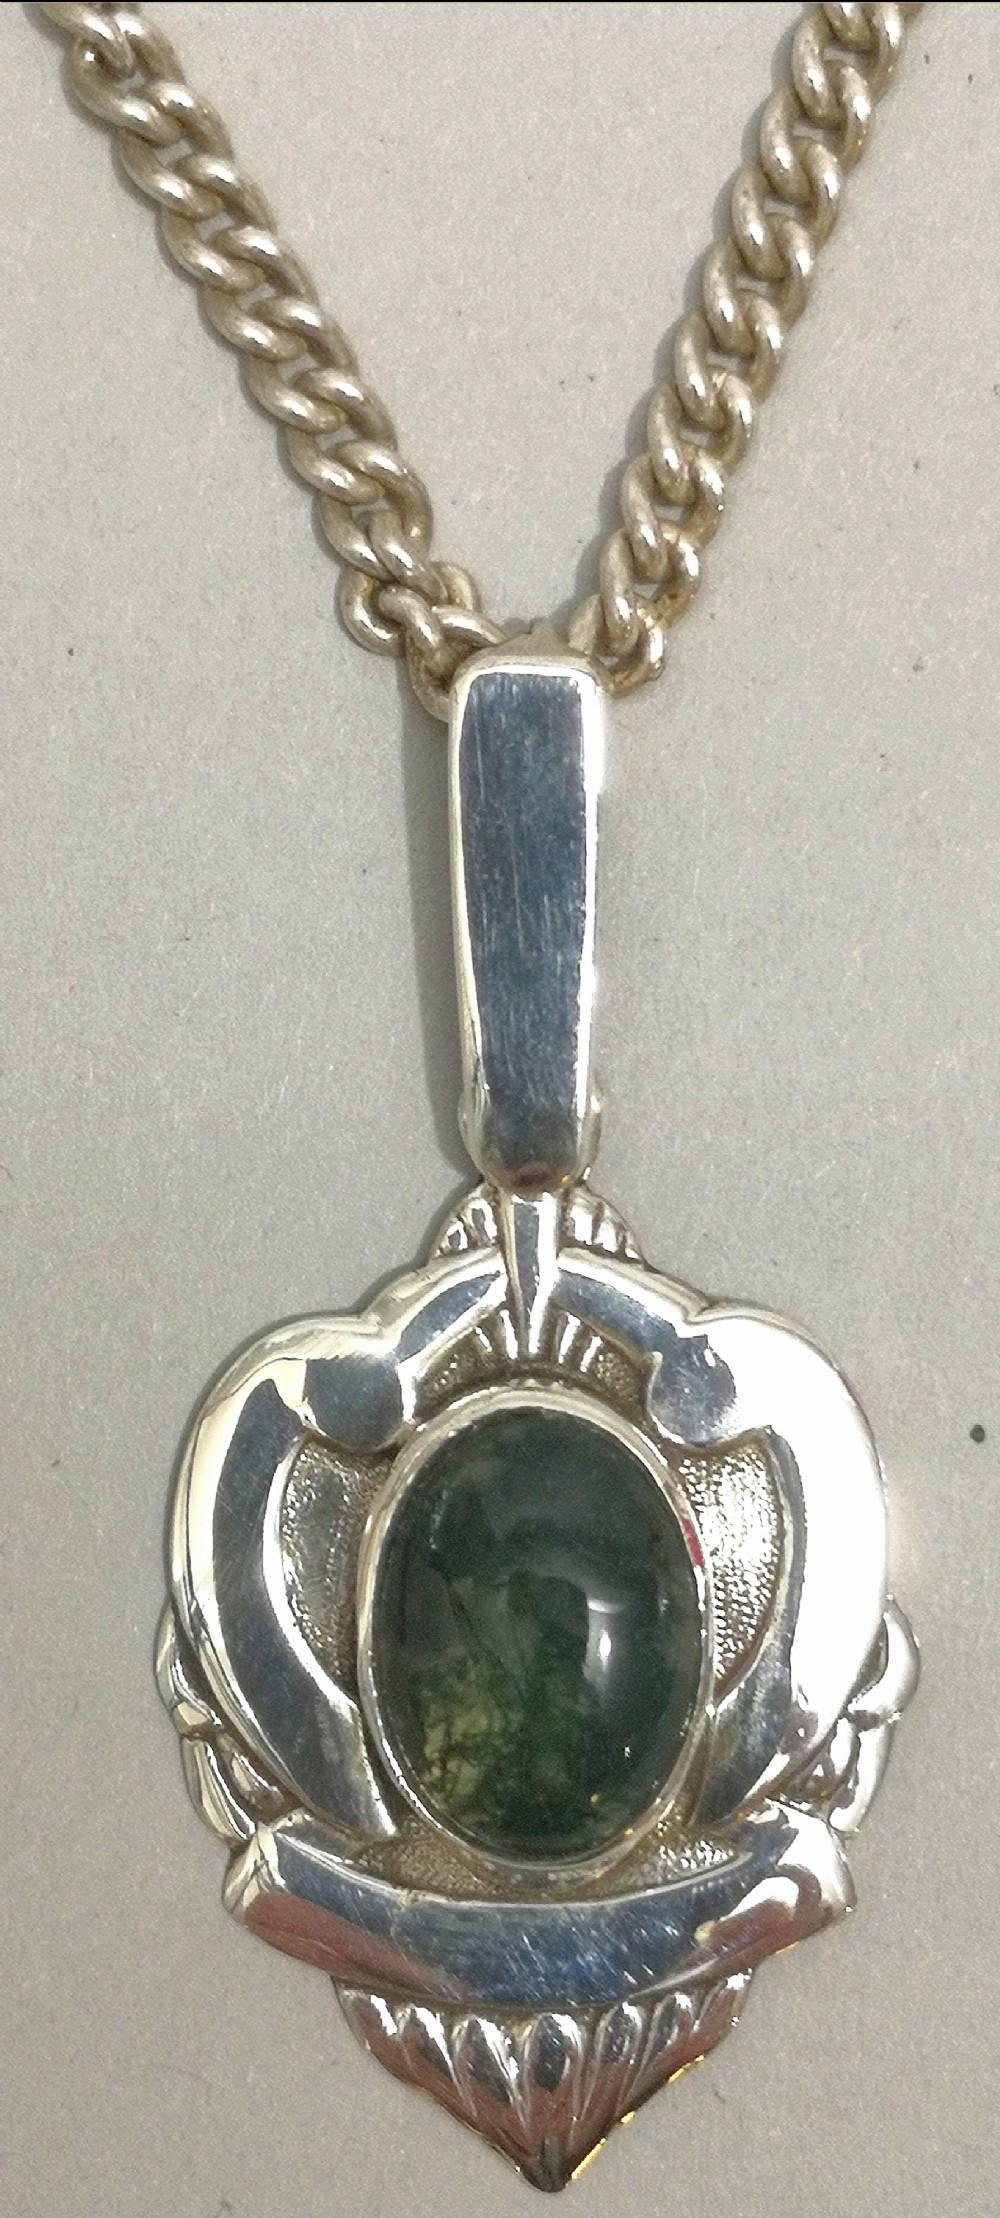 edwardian art nouveau sterling silver moss agate pendant